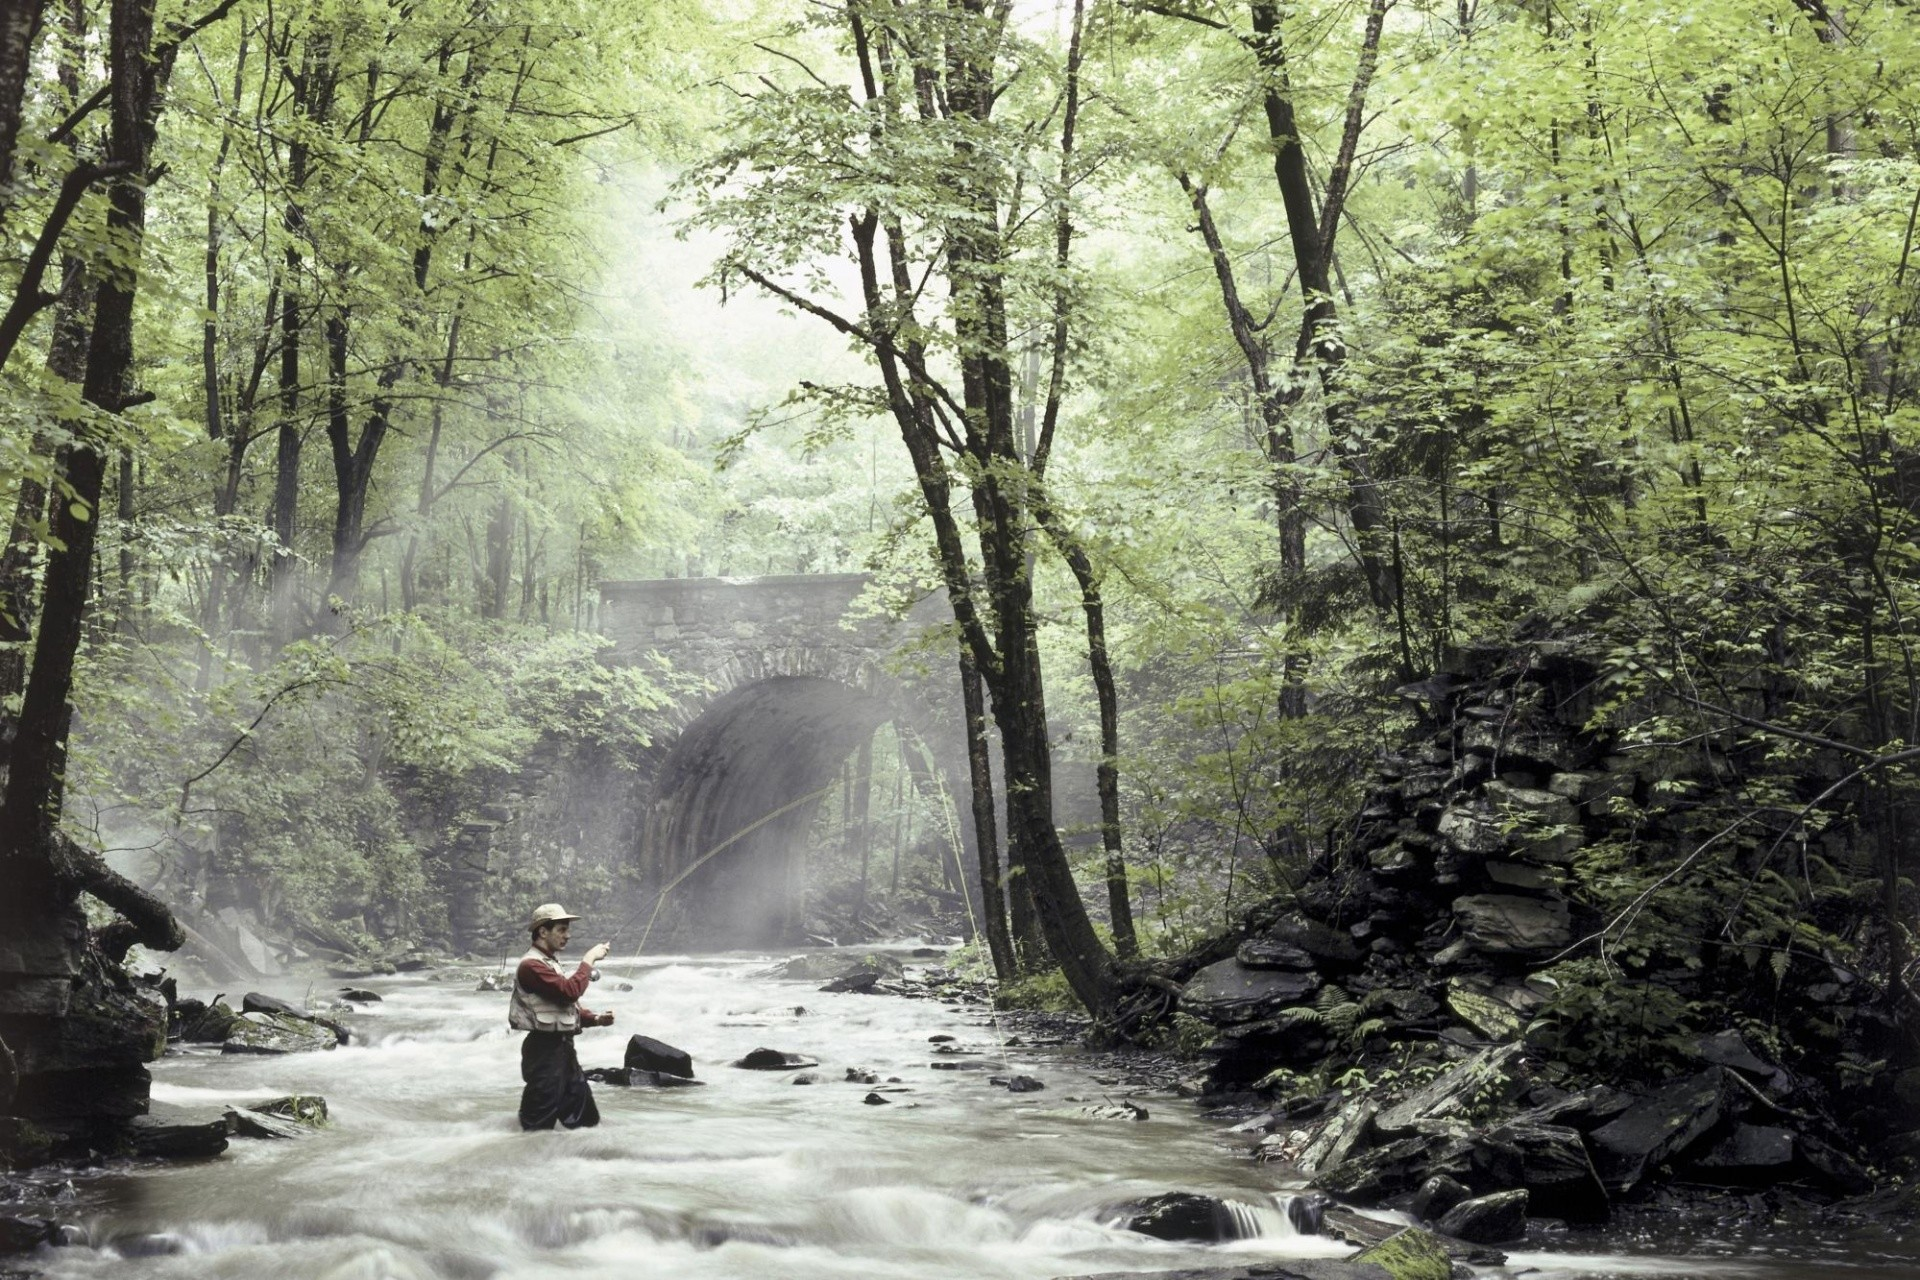 1920×1200 Fishing in the river desktop PC and Mac wallpaper